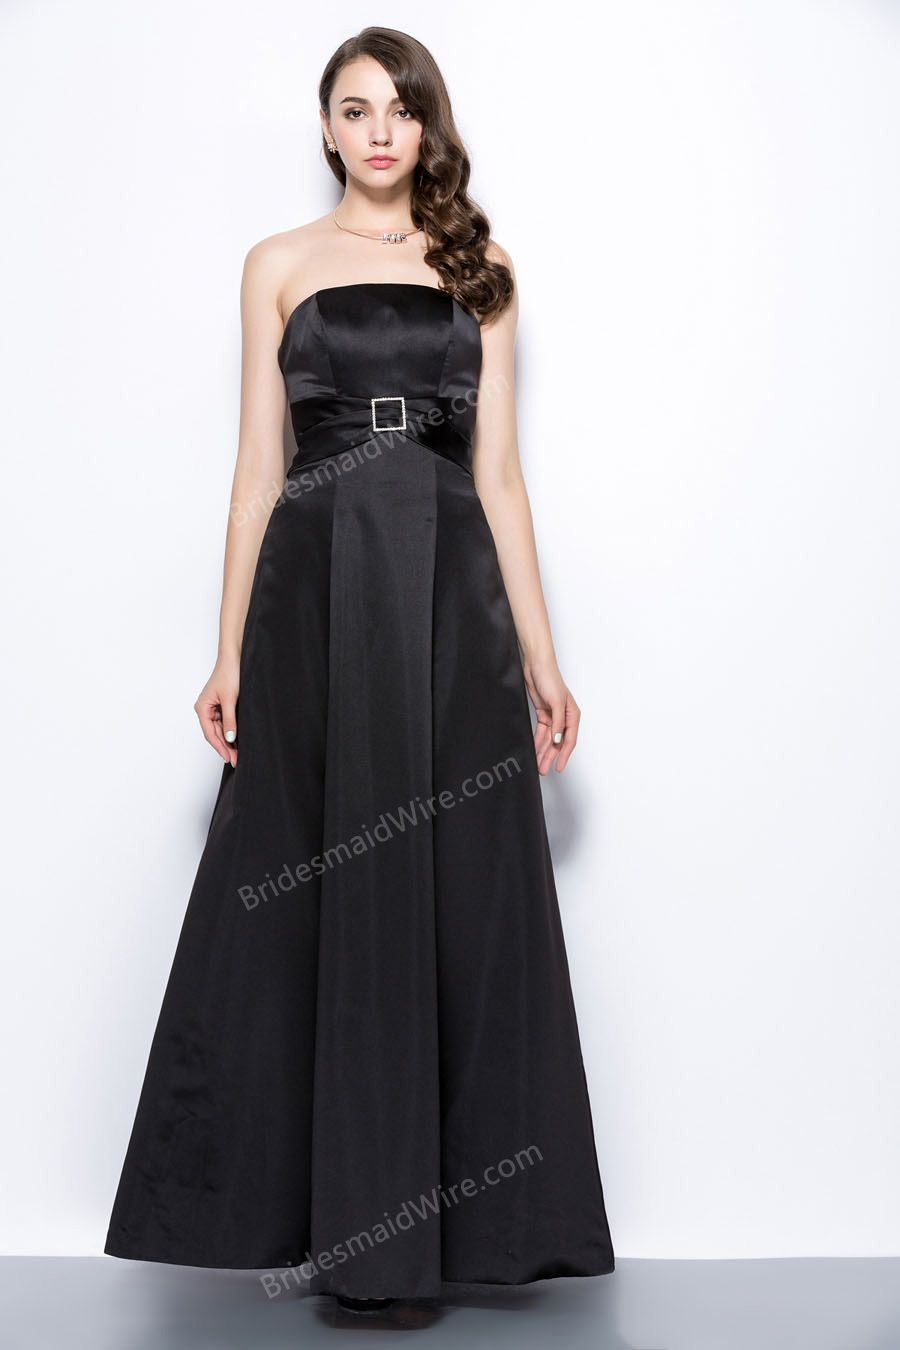 Simple empire waist bateau black satin slim aline bridesmaiddress